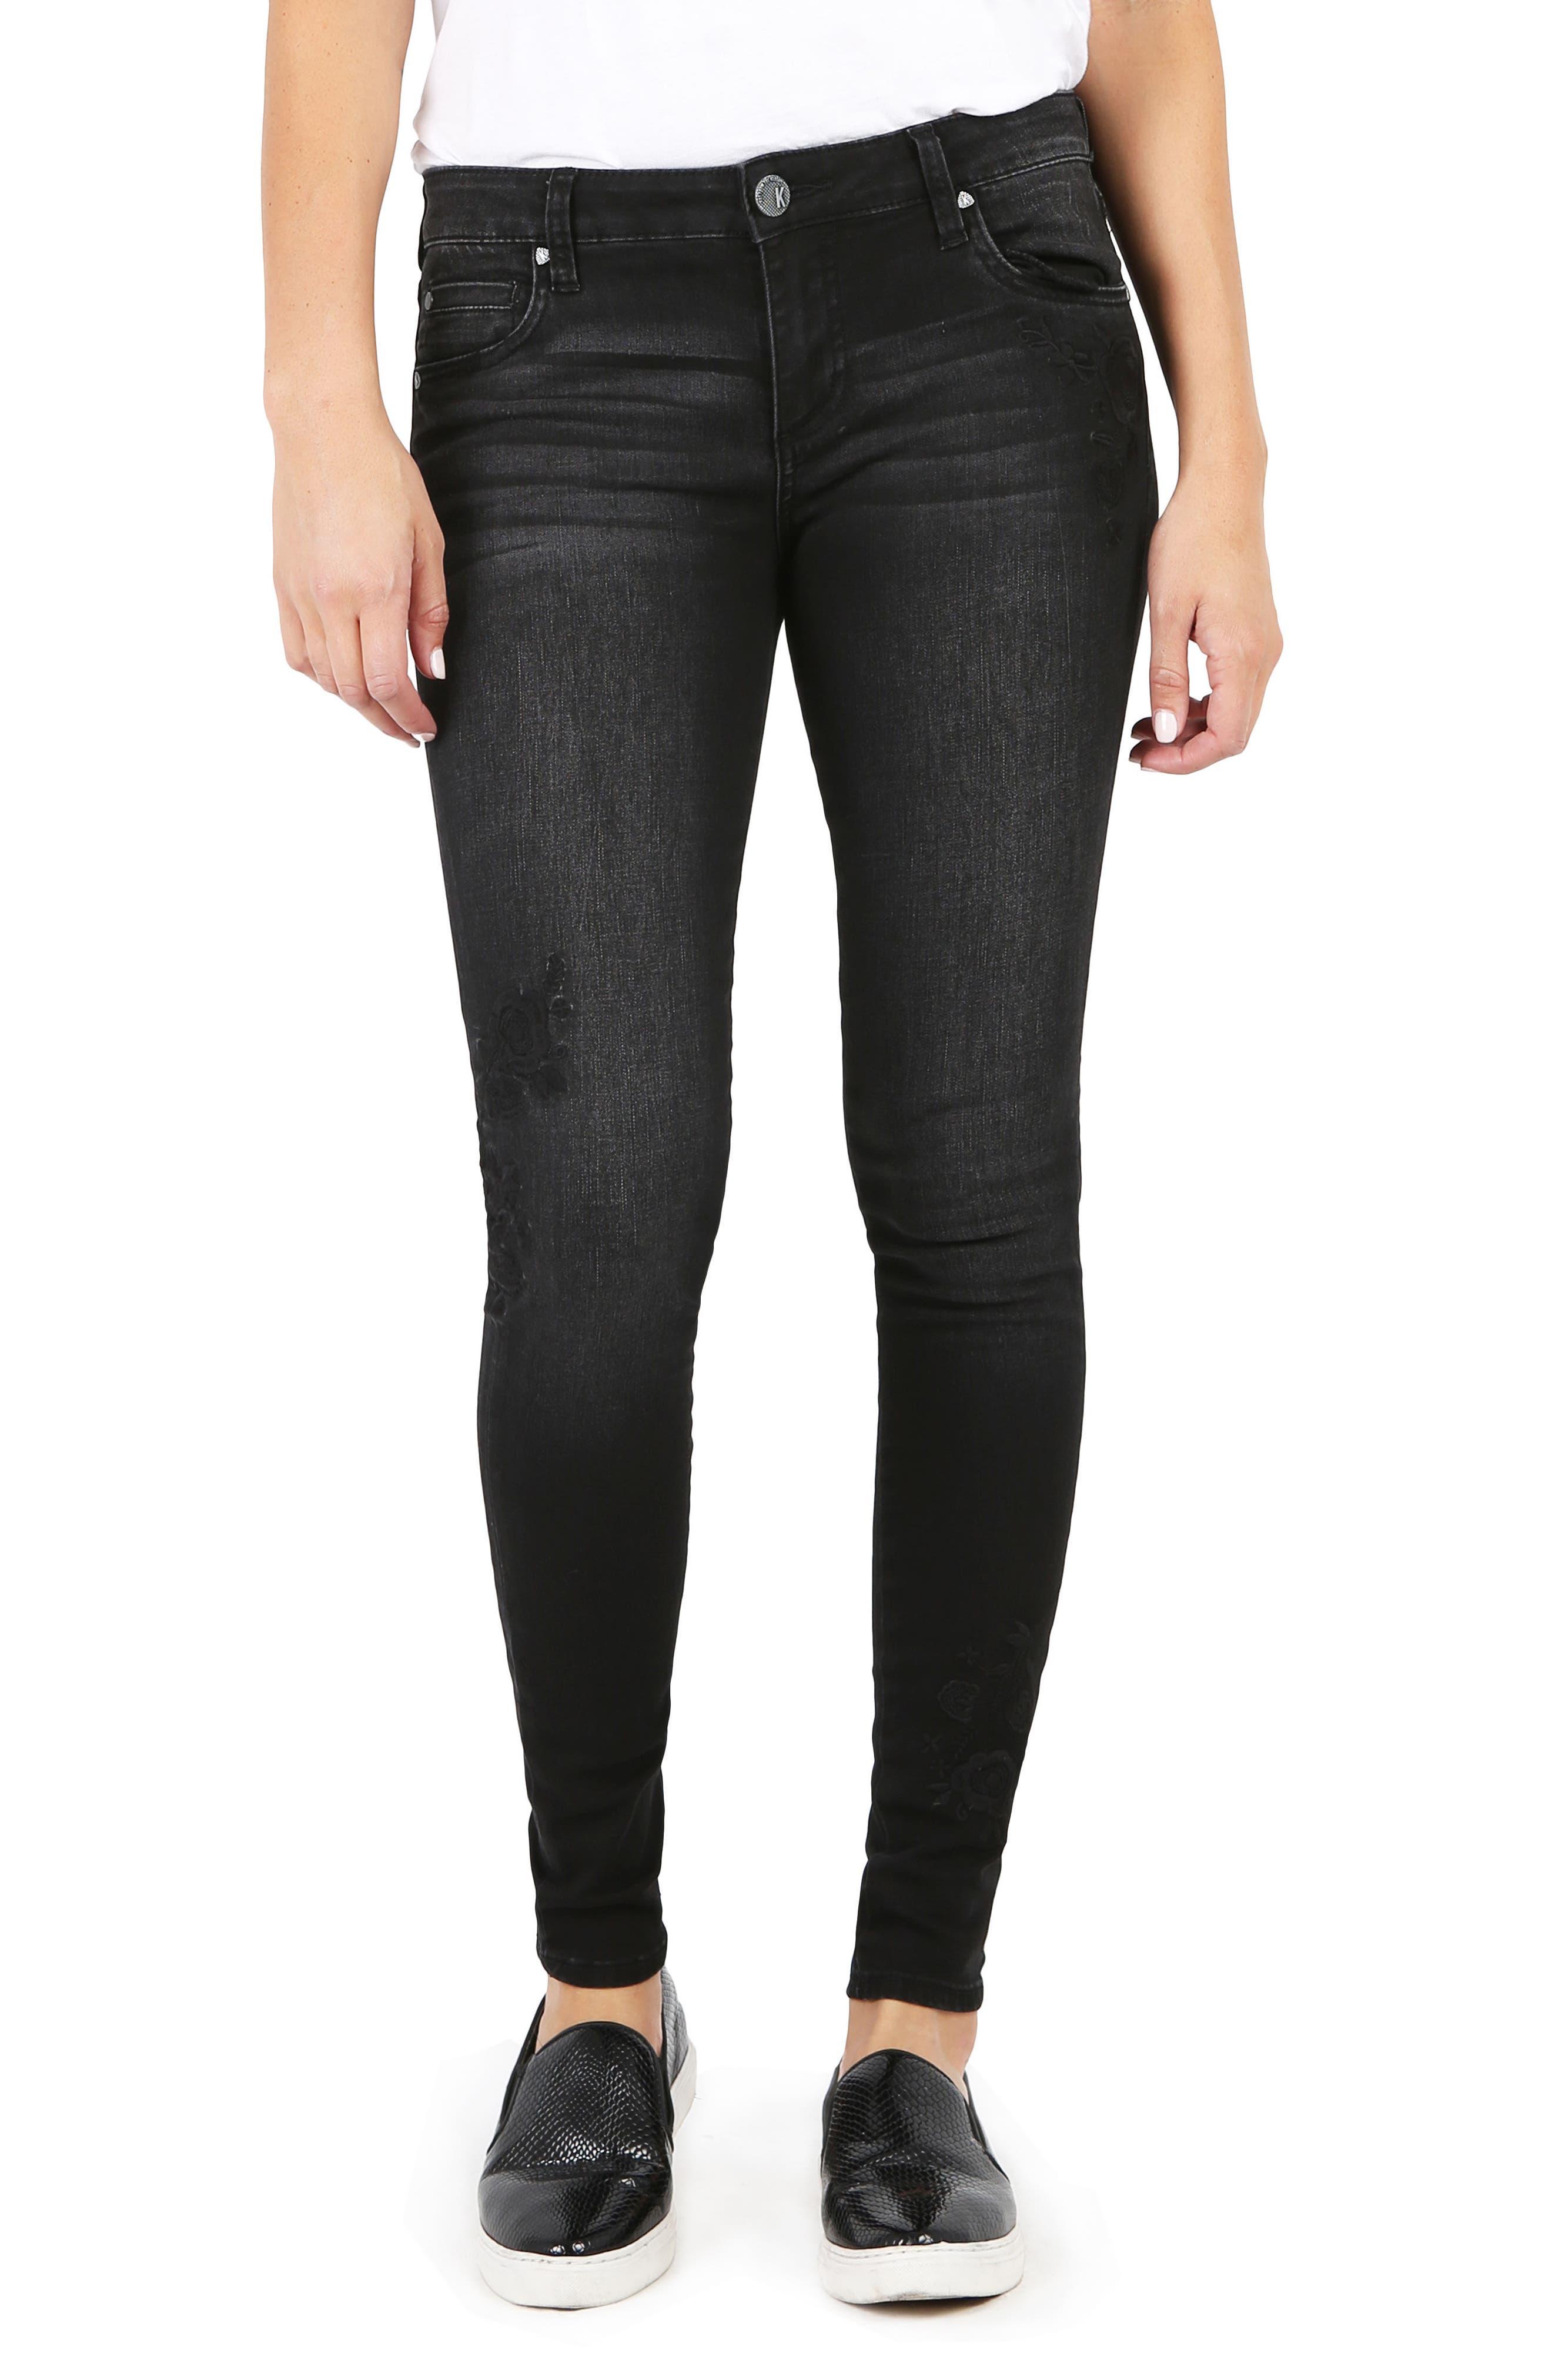 Low rise skinny grey jeans